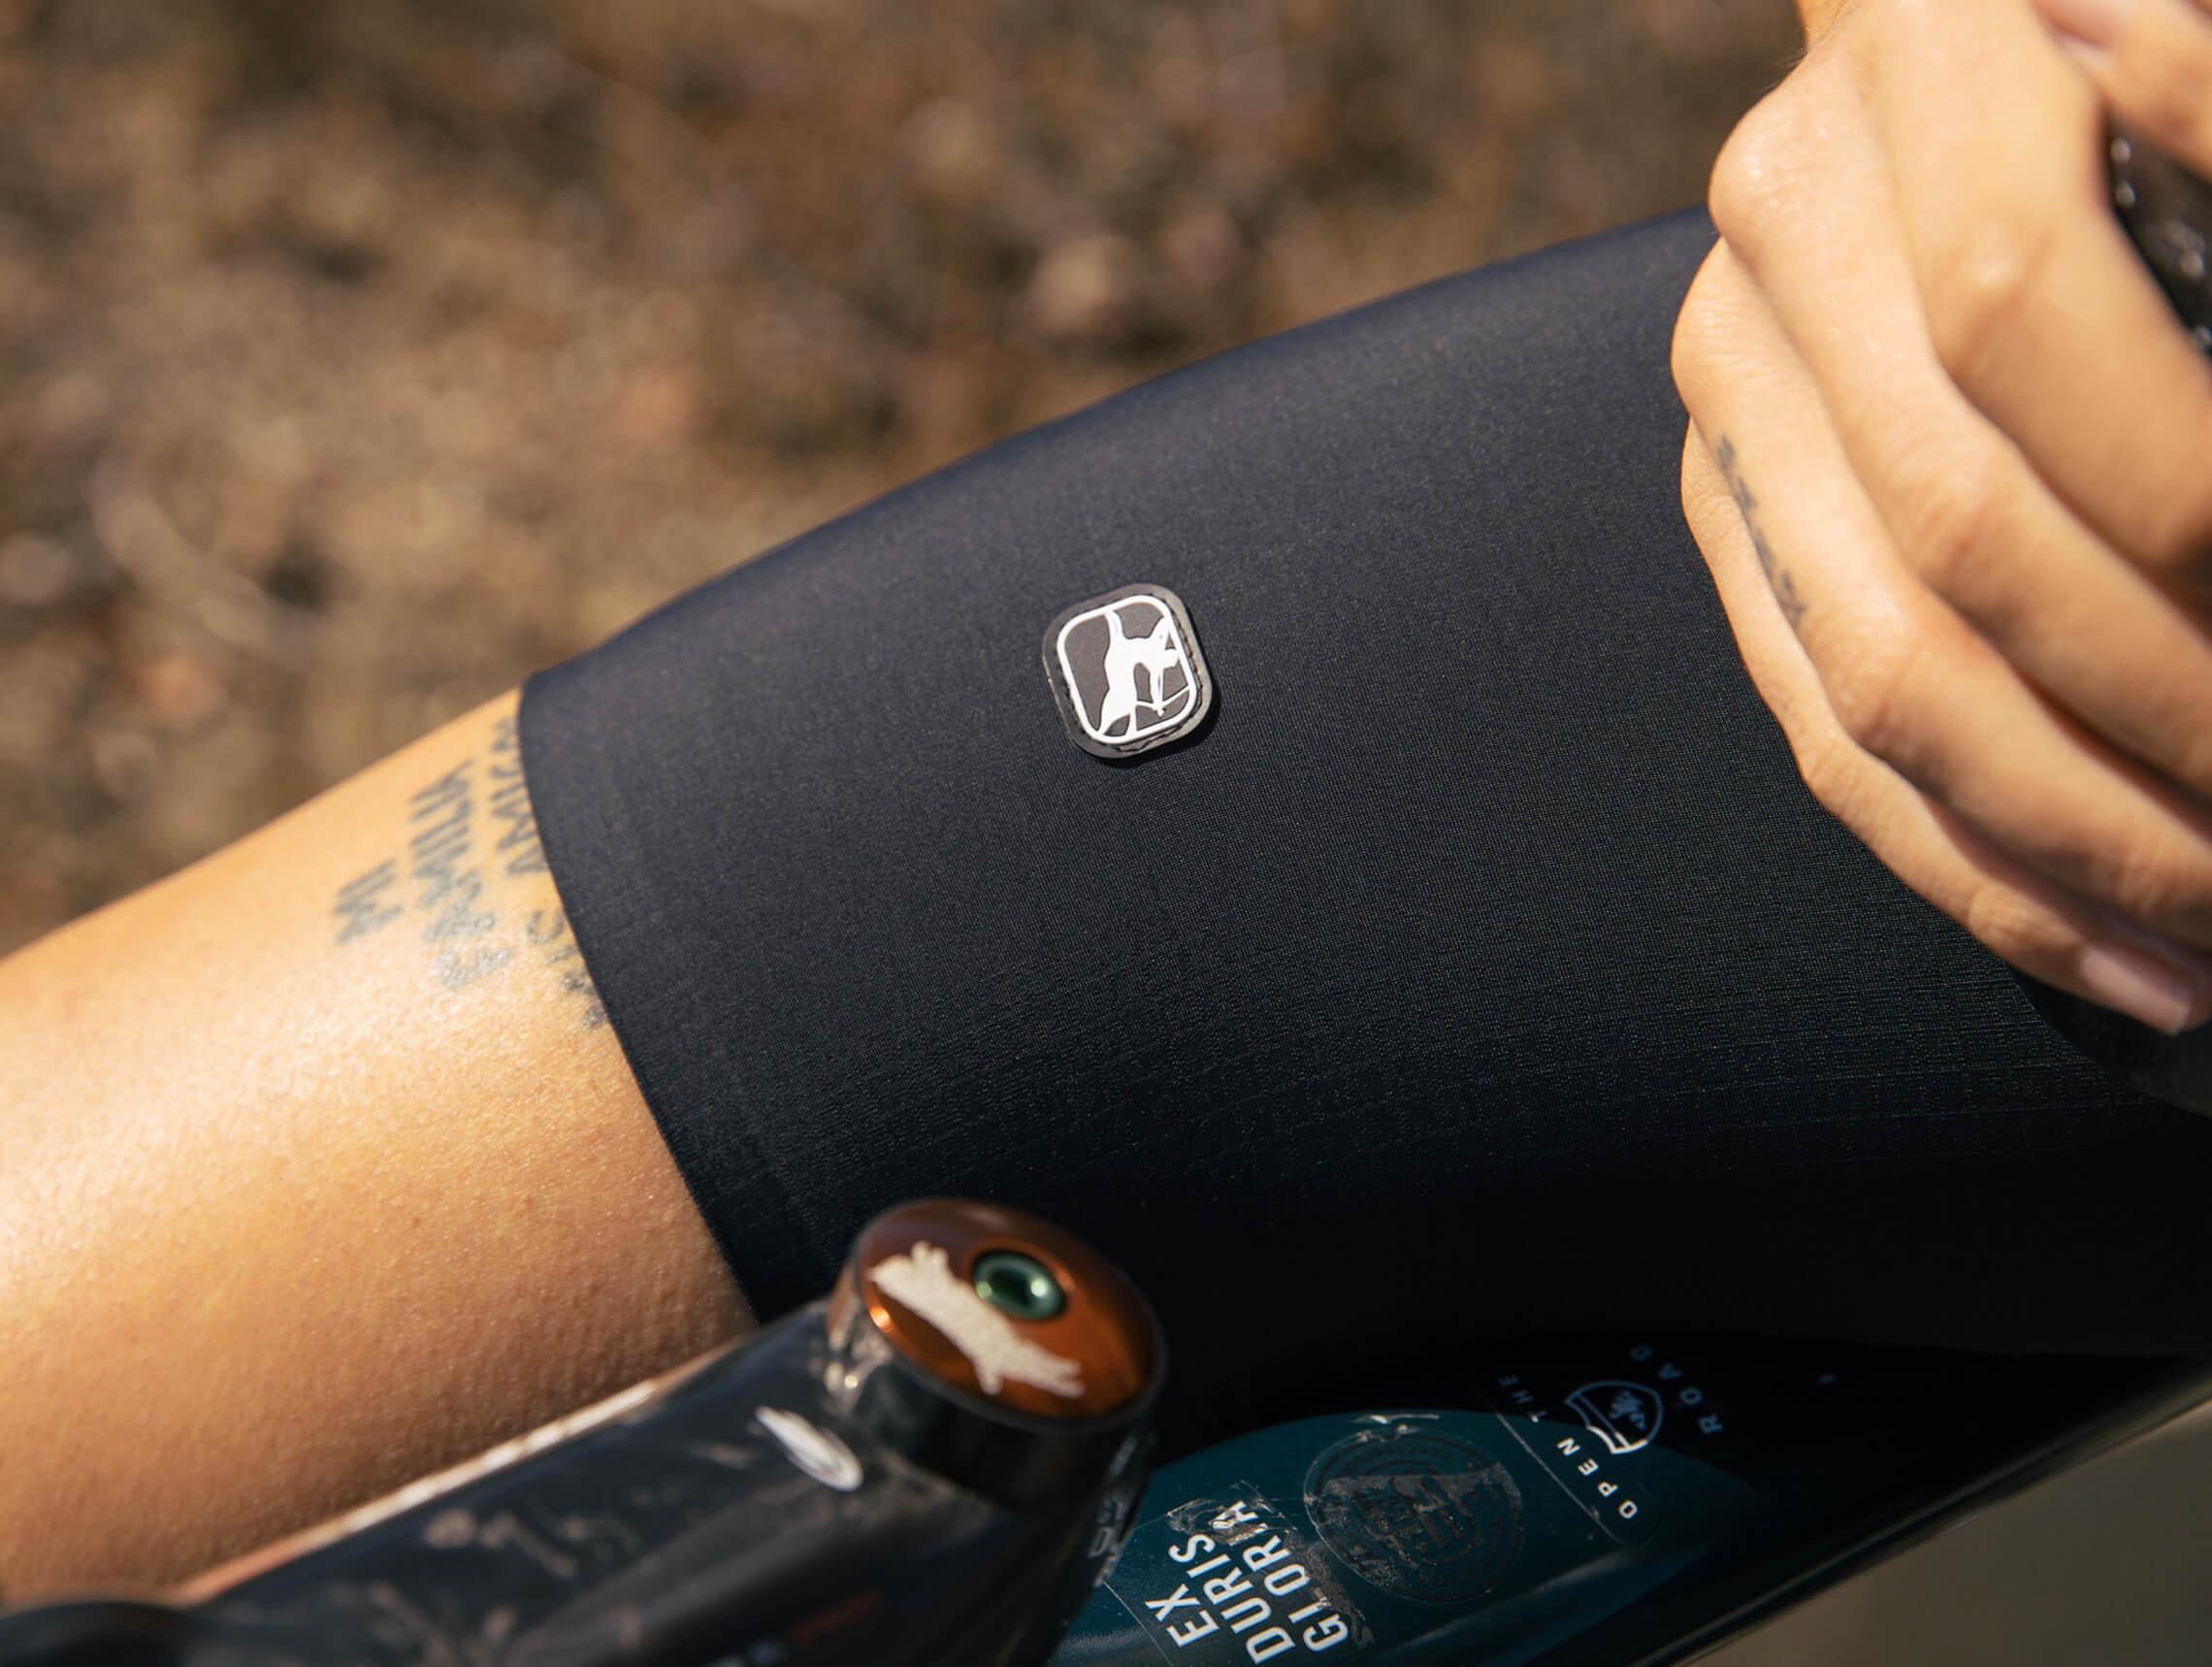 giordana-cycling-ss21-bib-guide-men-lungo-1-new